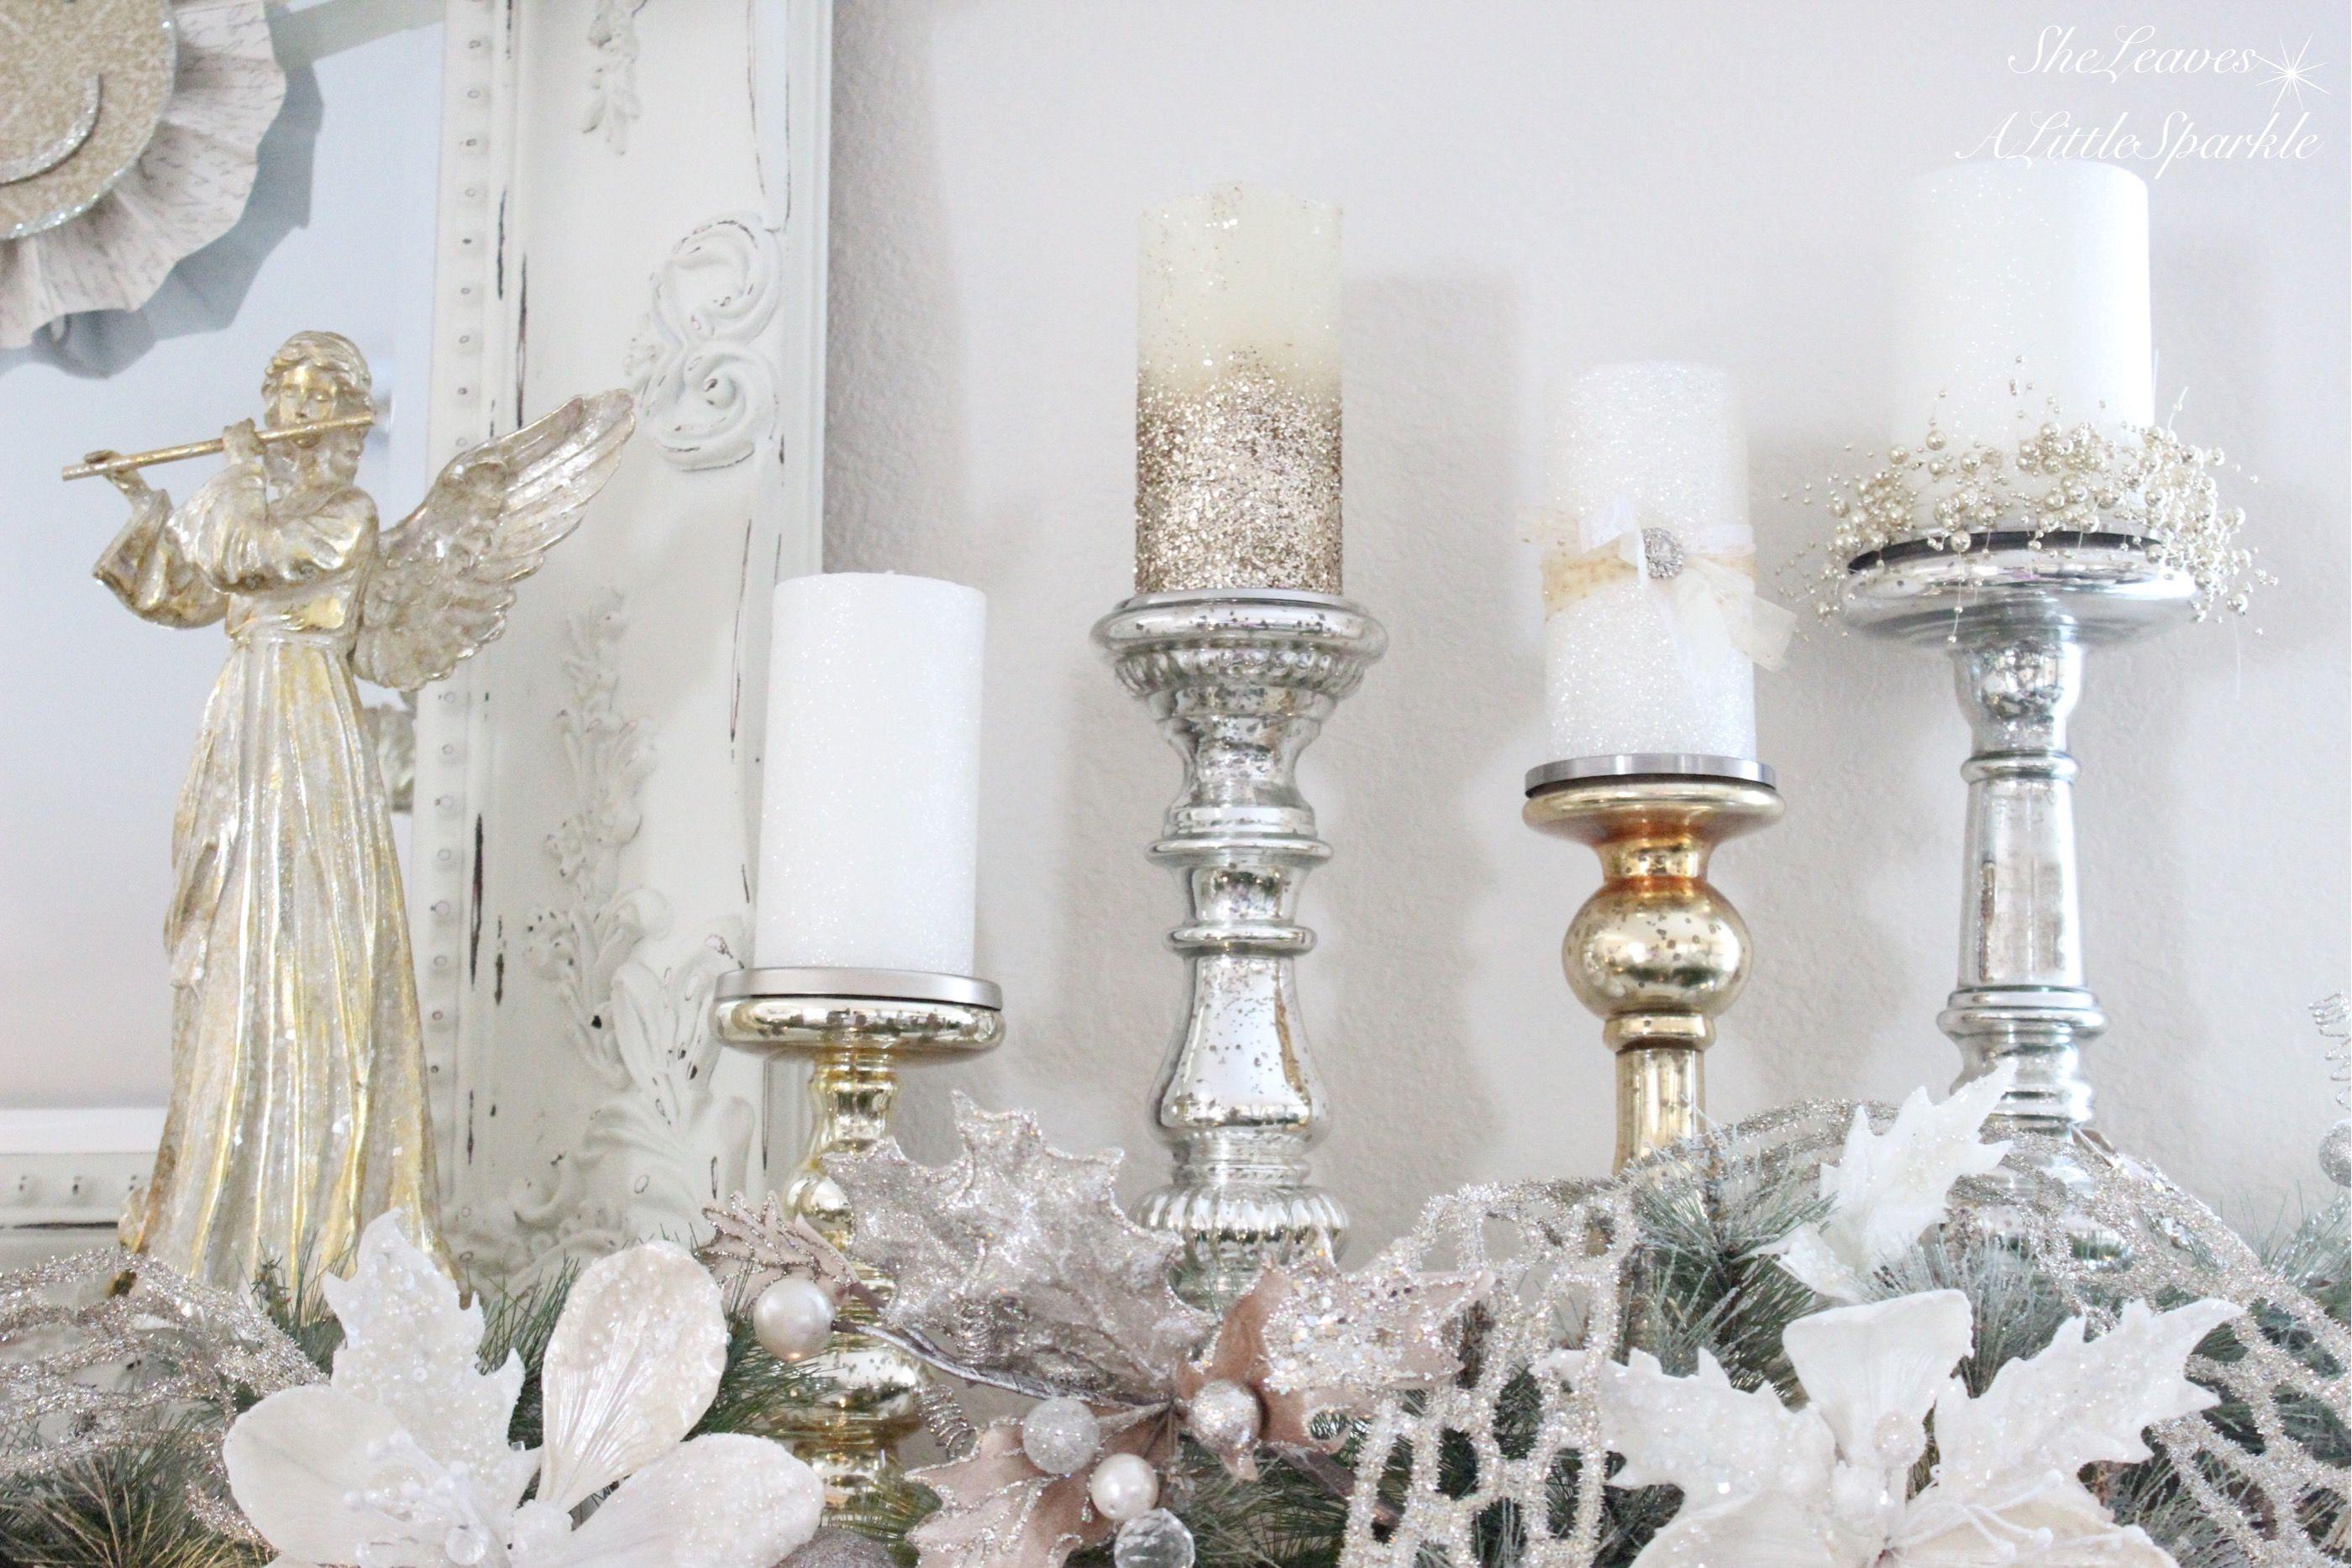 decor home s best r paris elegant eve new year years ideas christmas pitt the party agenda design decorating